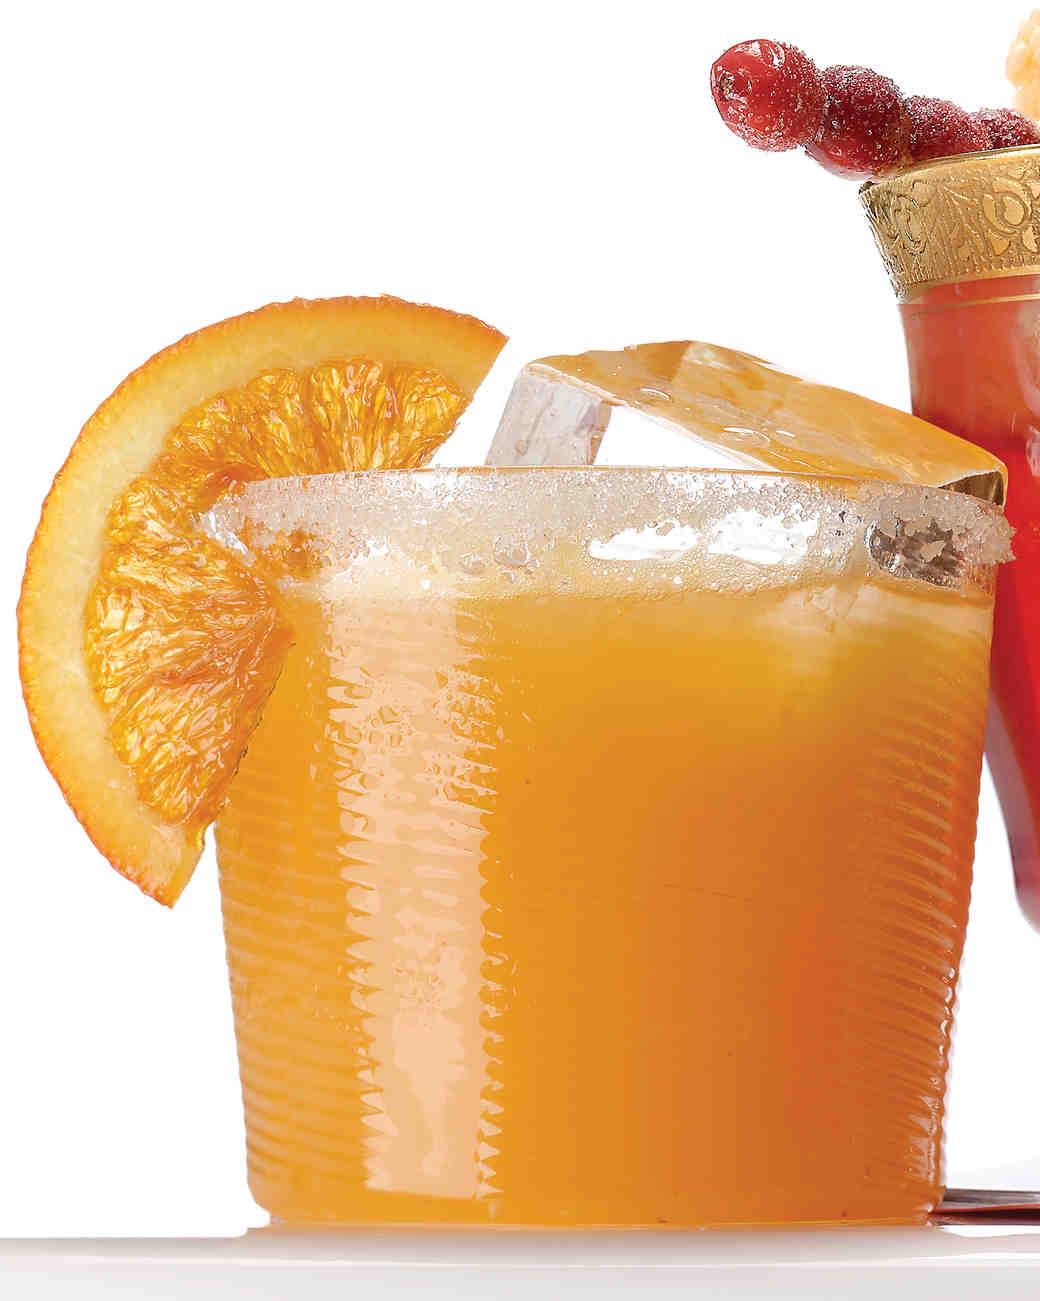 wedding-mocktail-recipes-sparkling-cider-cara-cara-orange-punch-mld104008-msl-dec08-0915.jpg